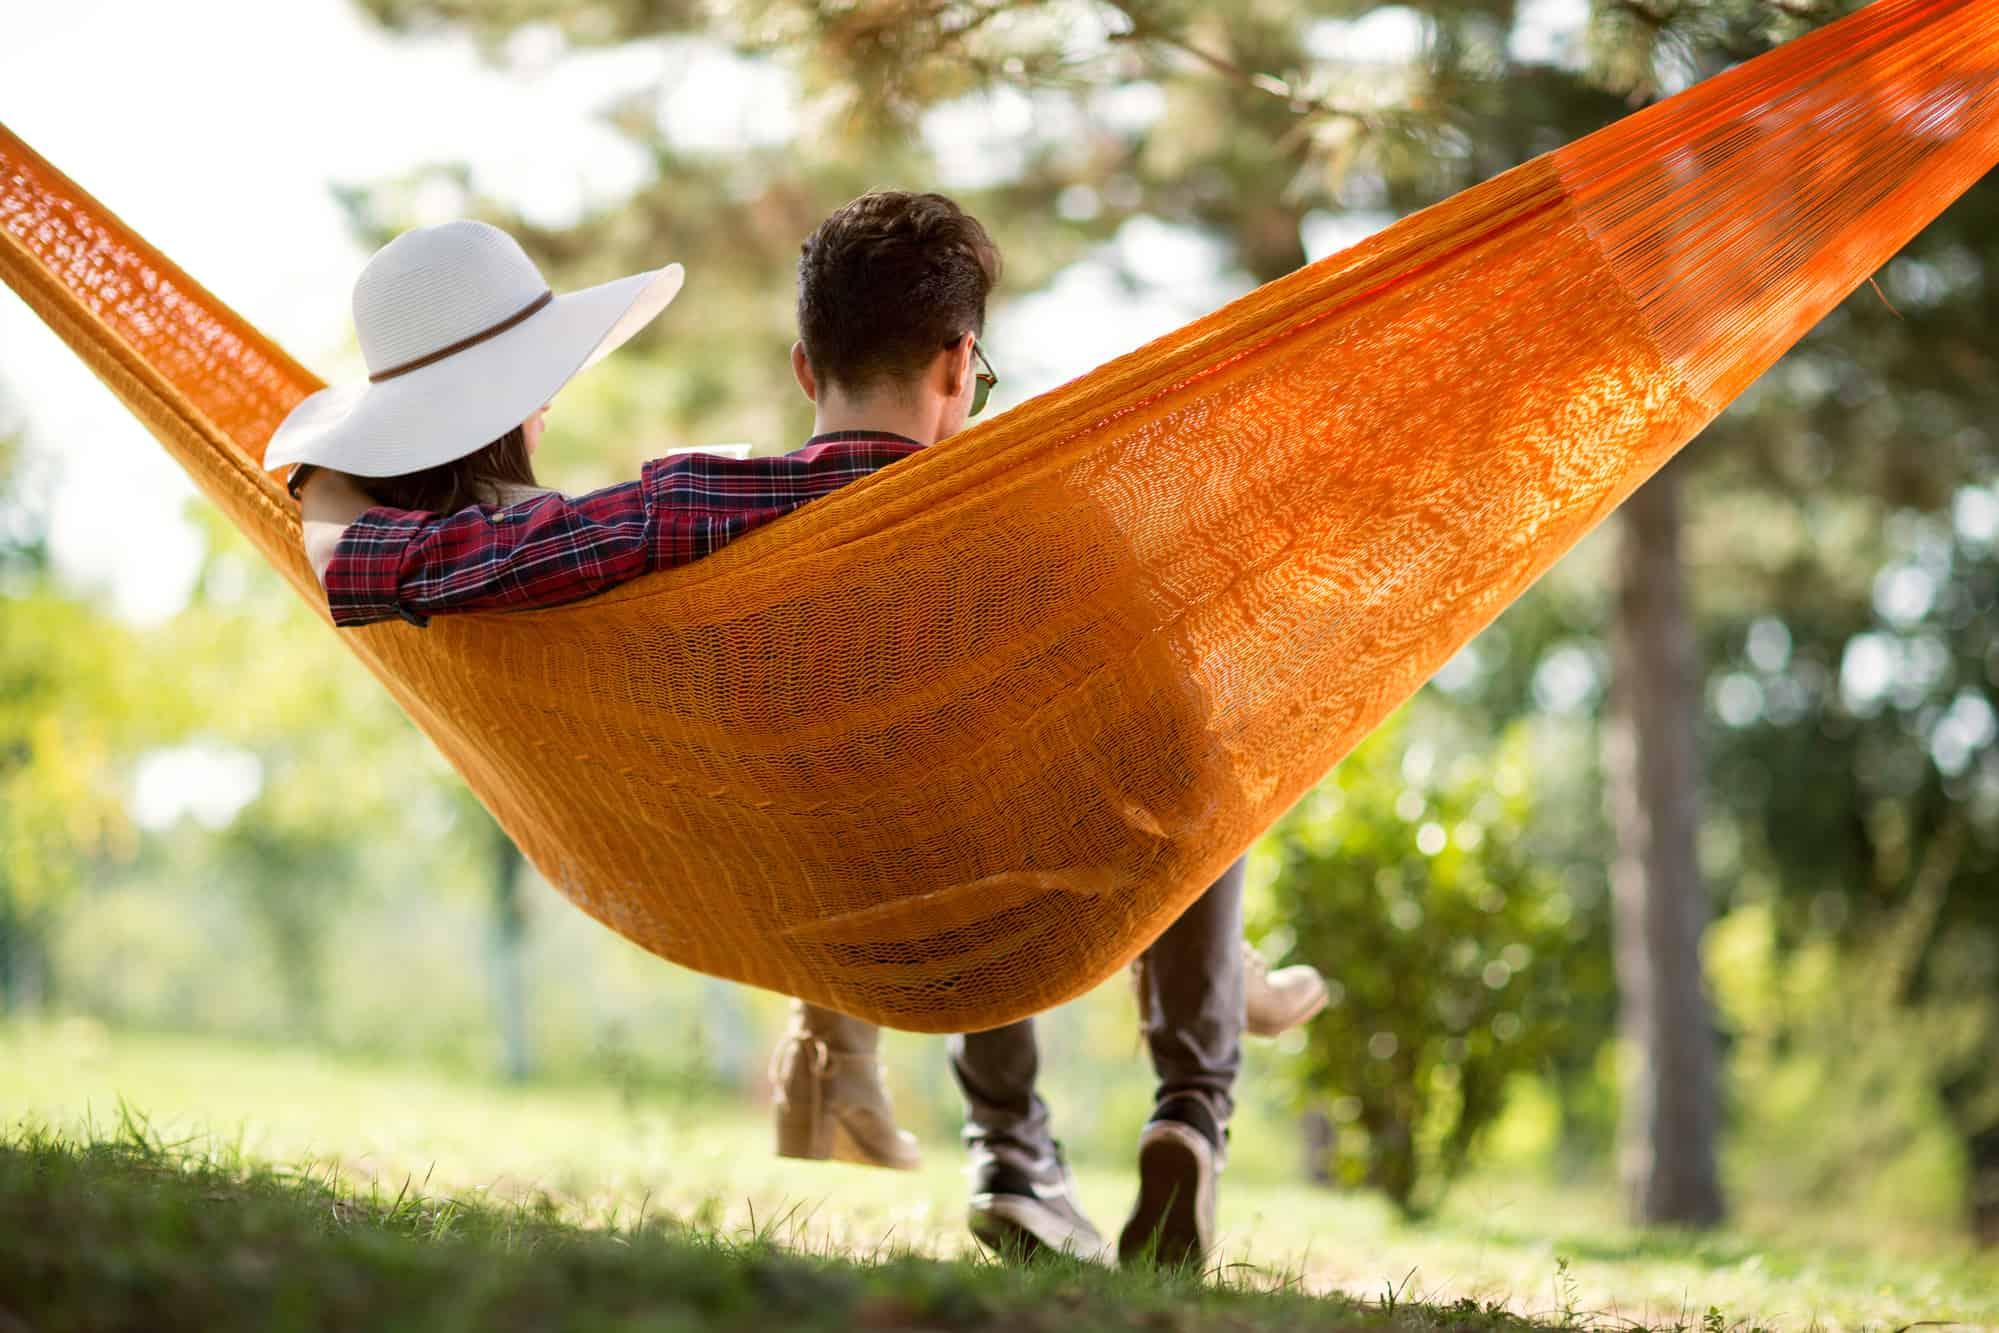 young couple enjoying at home date night in an orange hammock in their backyard